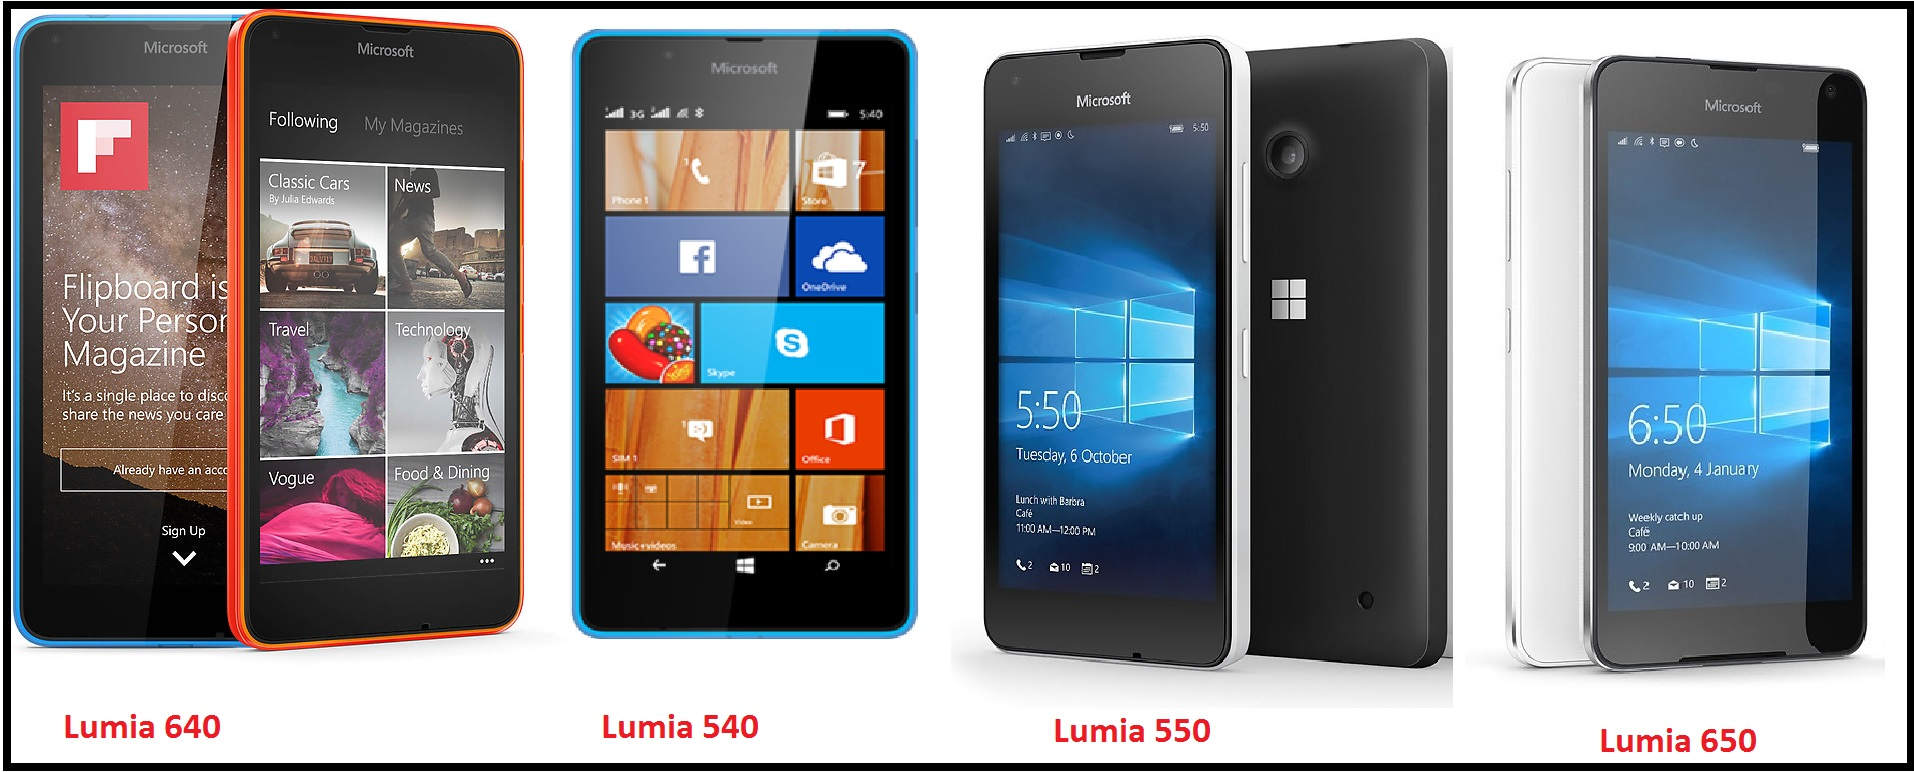 Lumia 550 vs Lumia 650 vs Lumia 640 vs Lumia 540